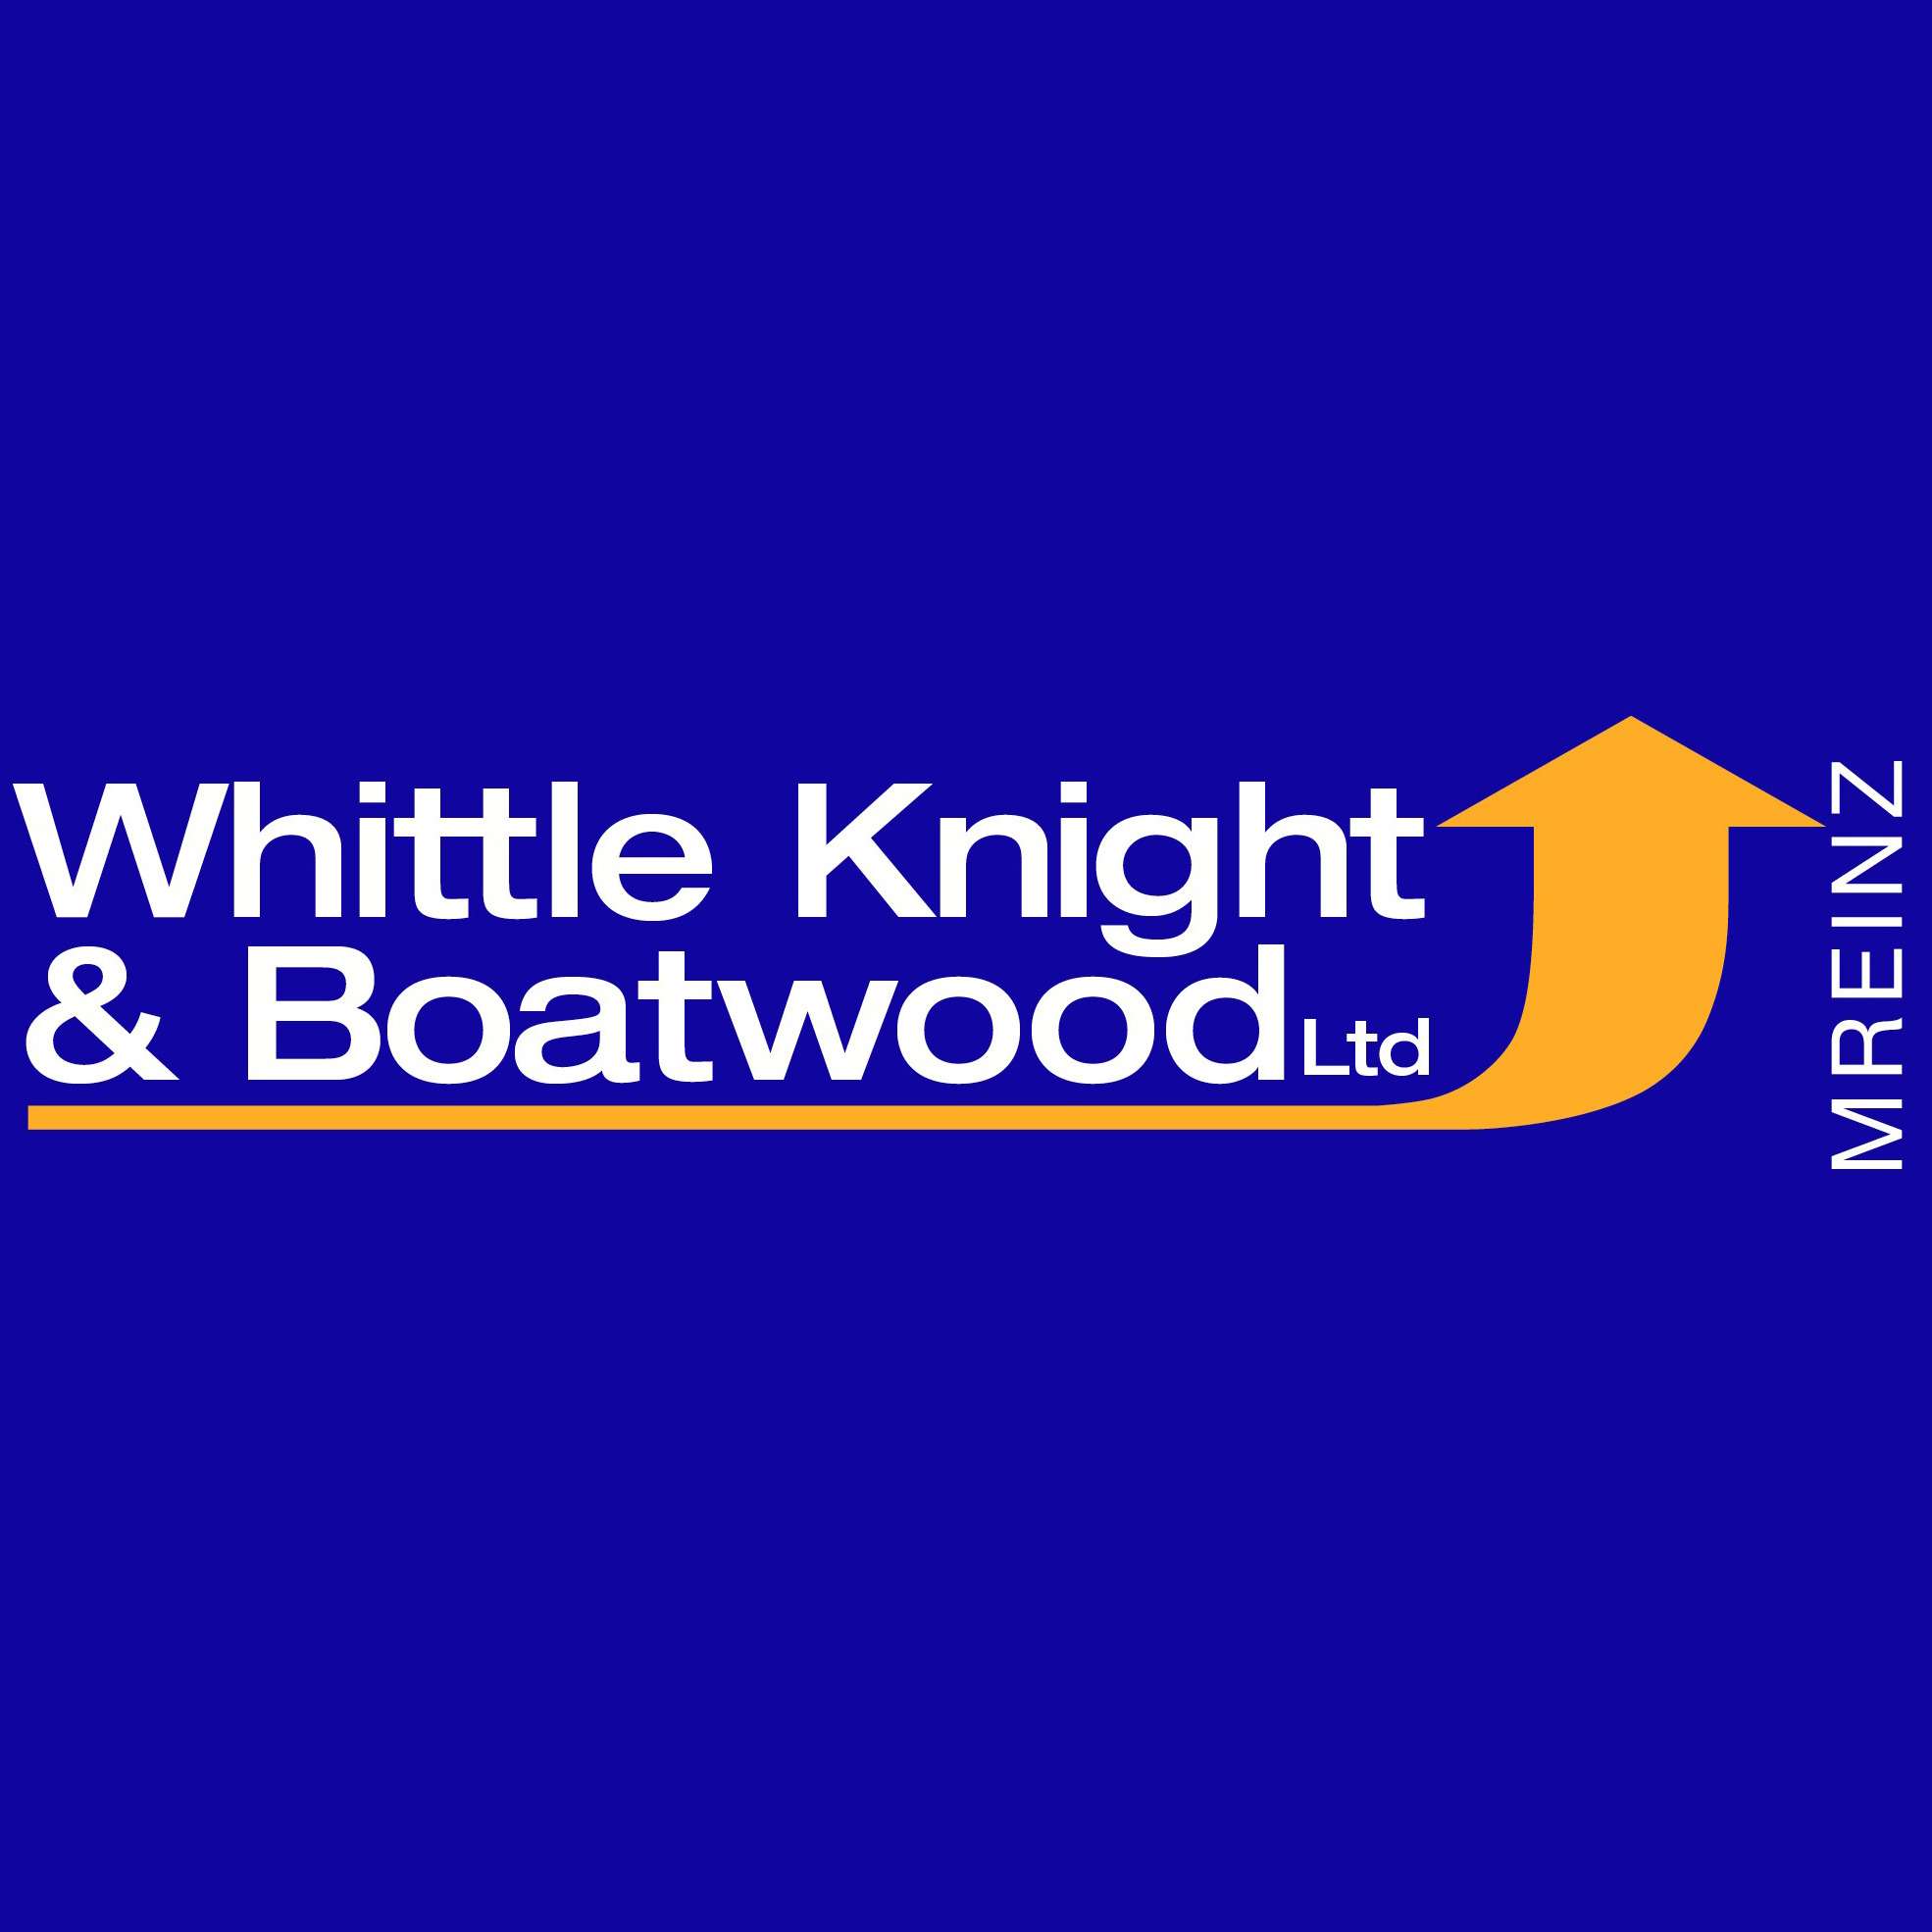 Whittle Knight & Boatwood Ltd